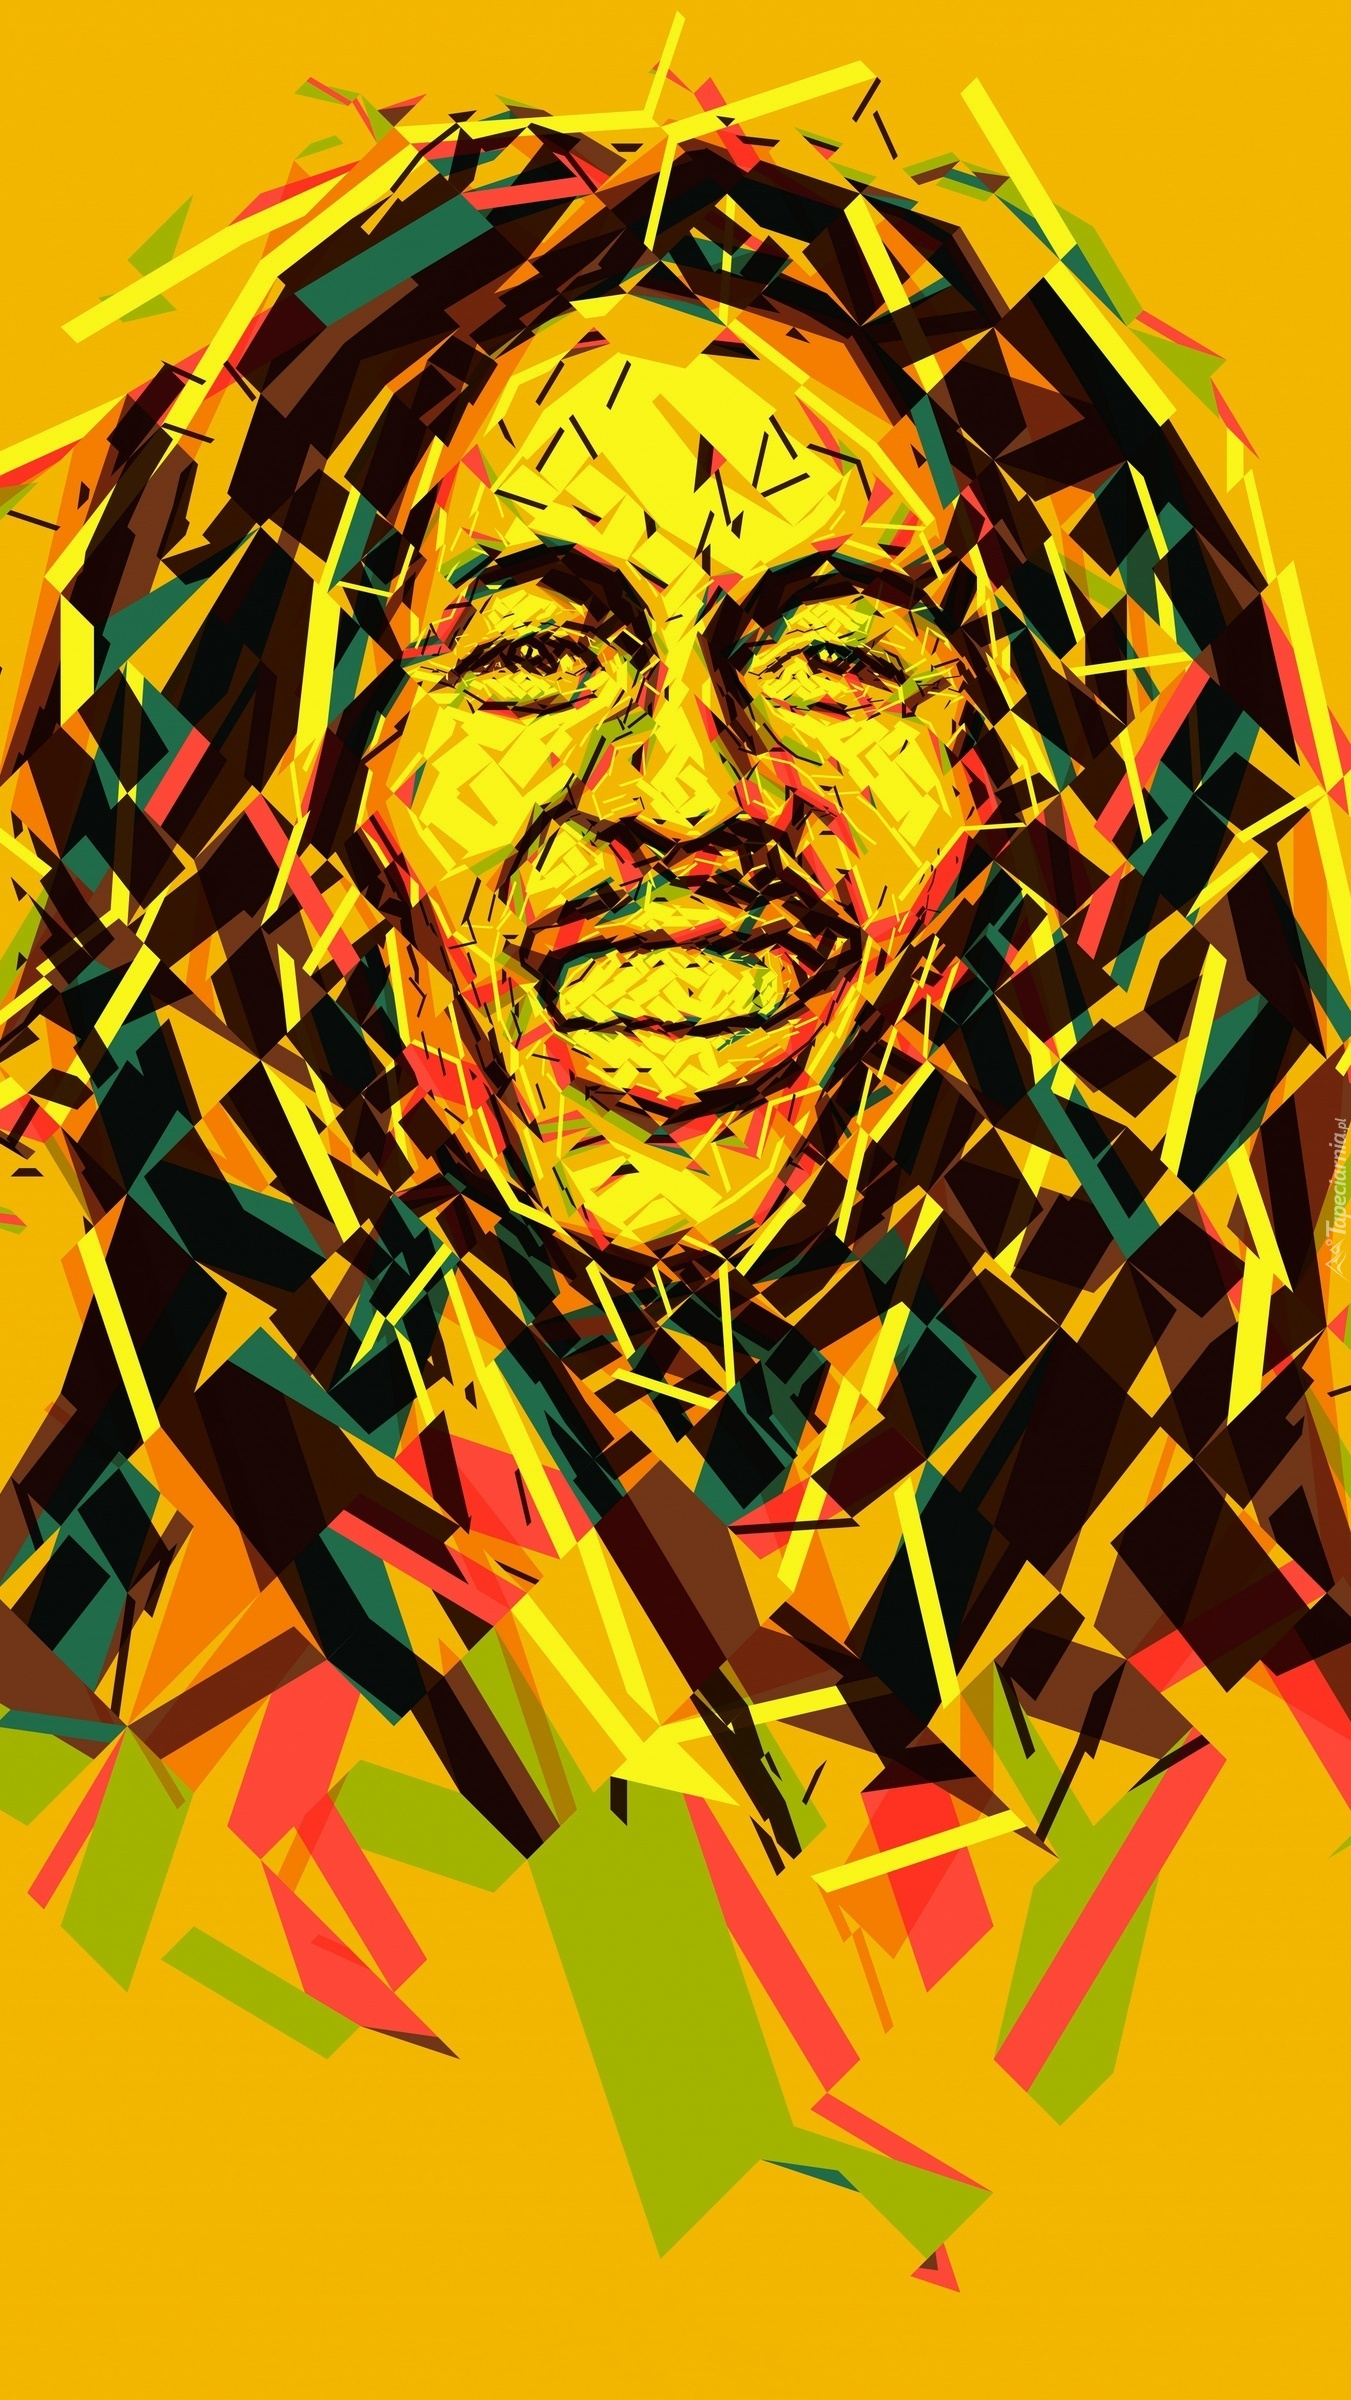 Portret Boba Marleya w grafice